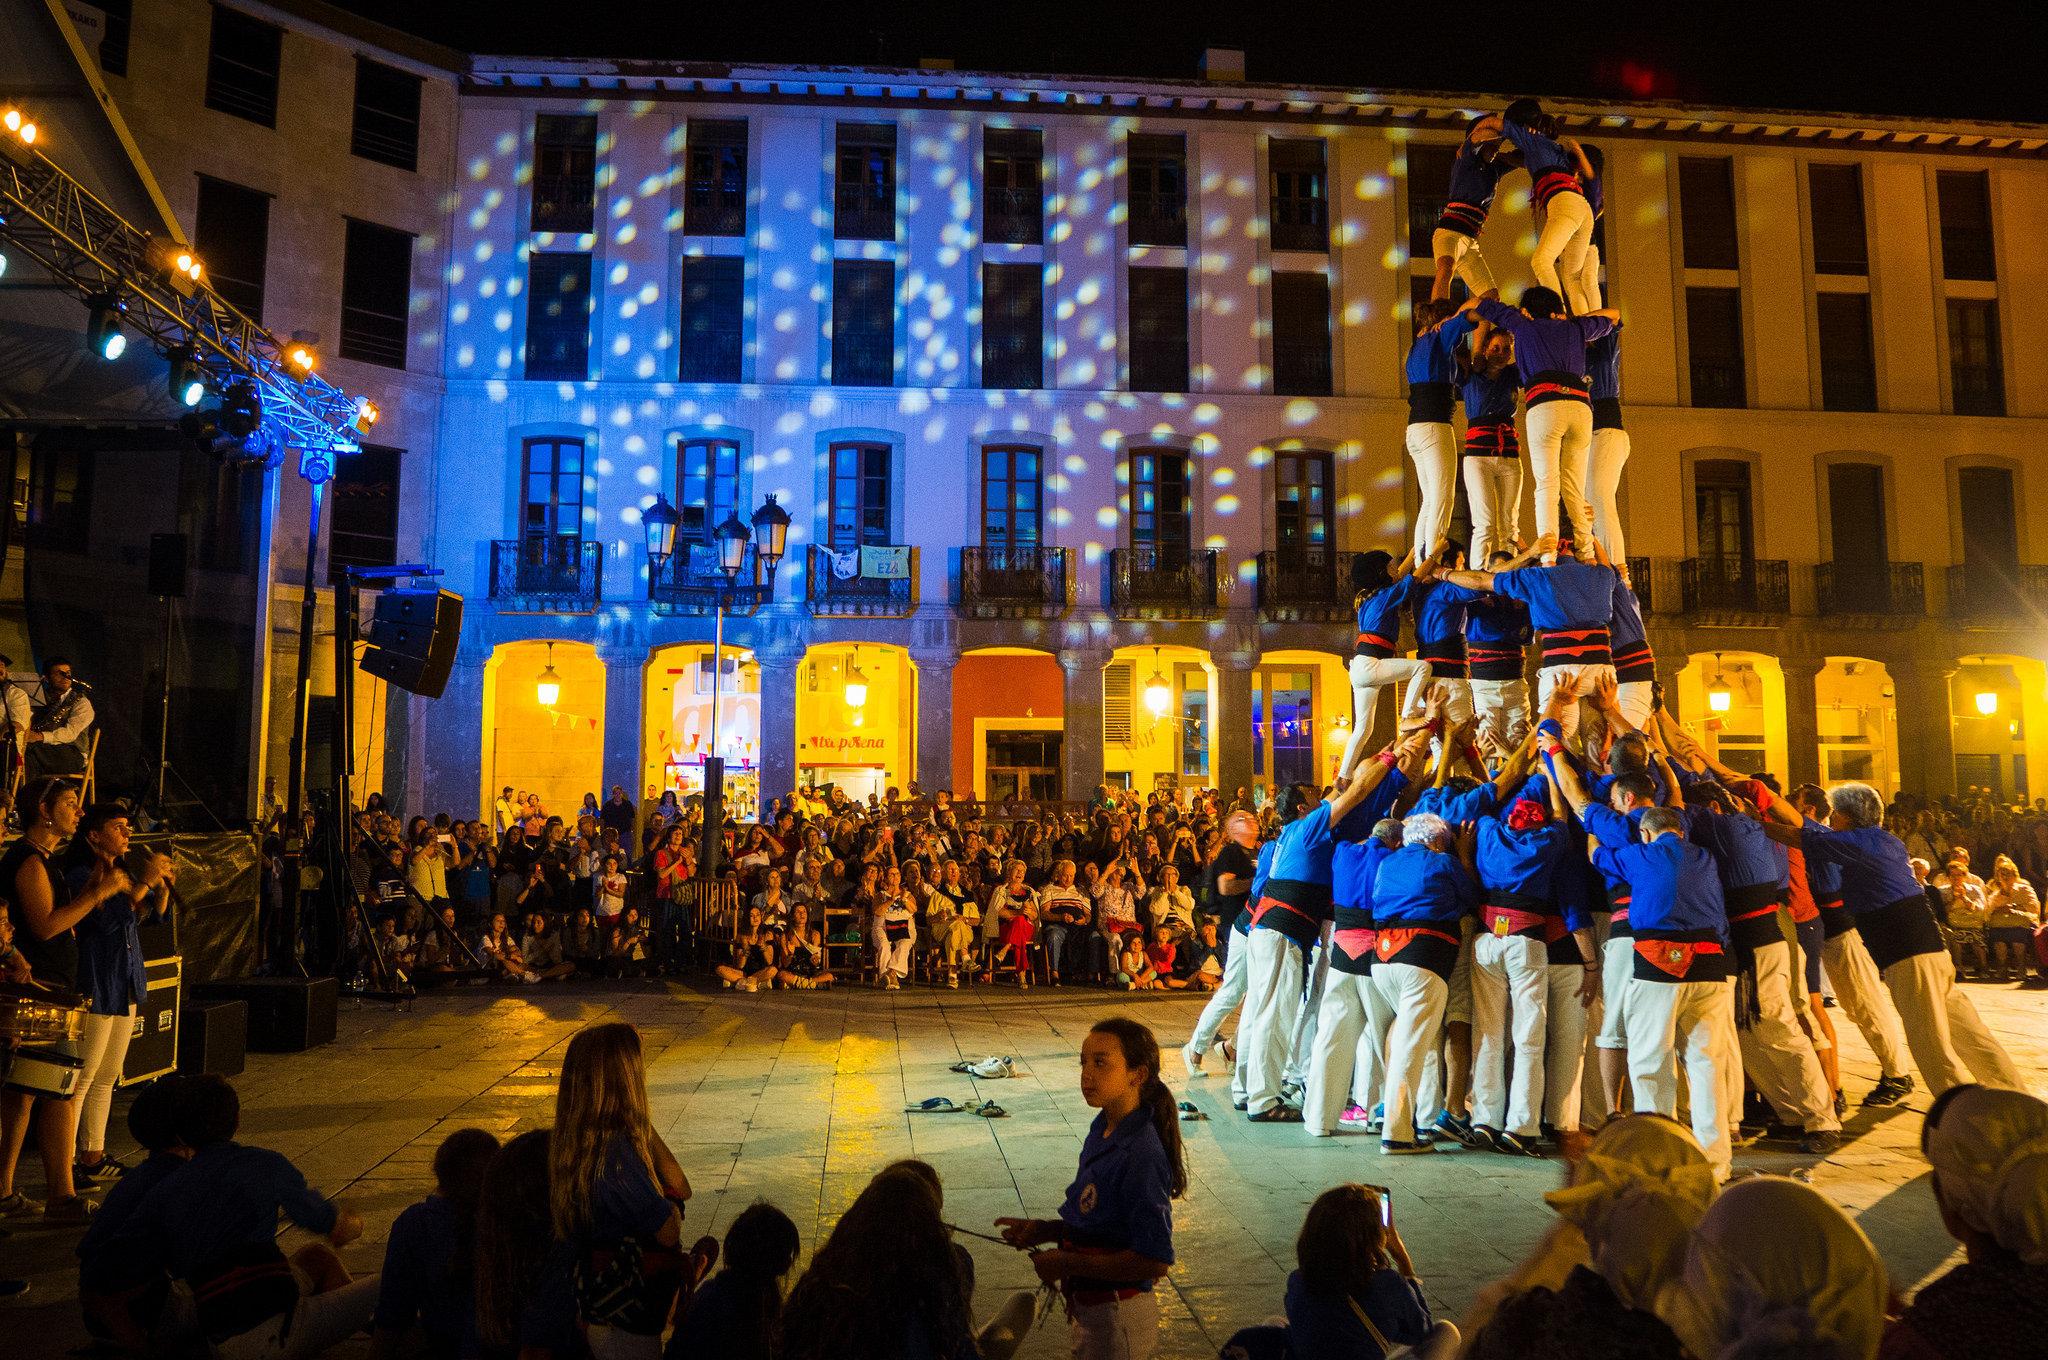 'Castellers' durante una fiesta popular catalana.